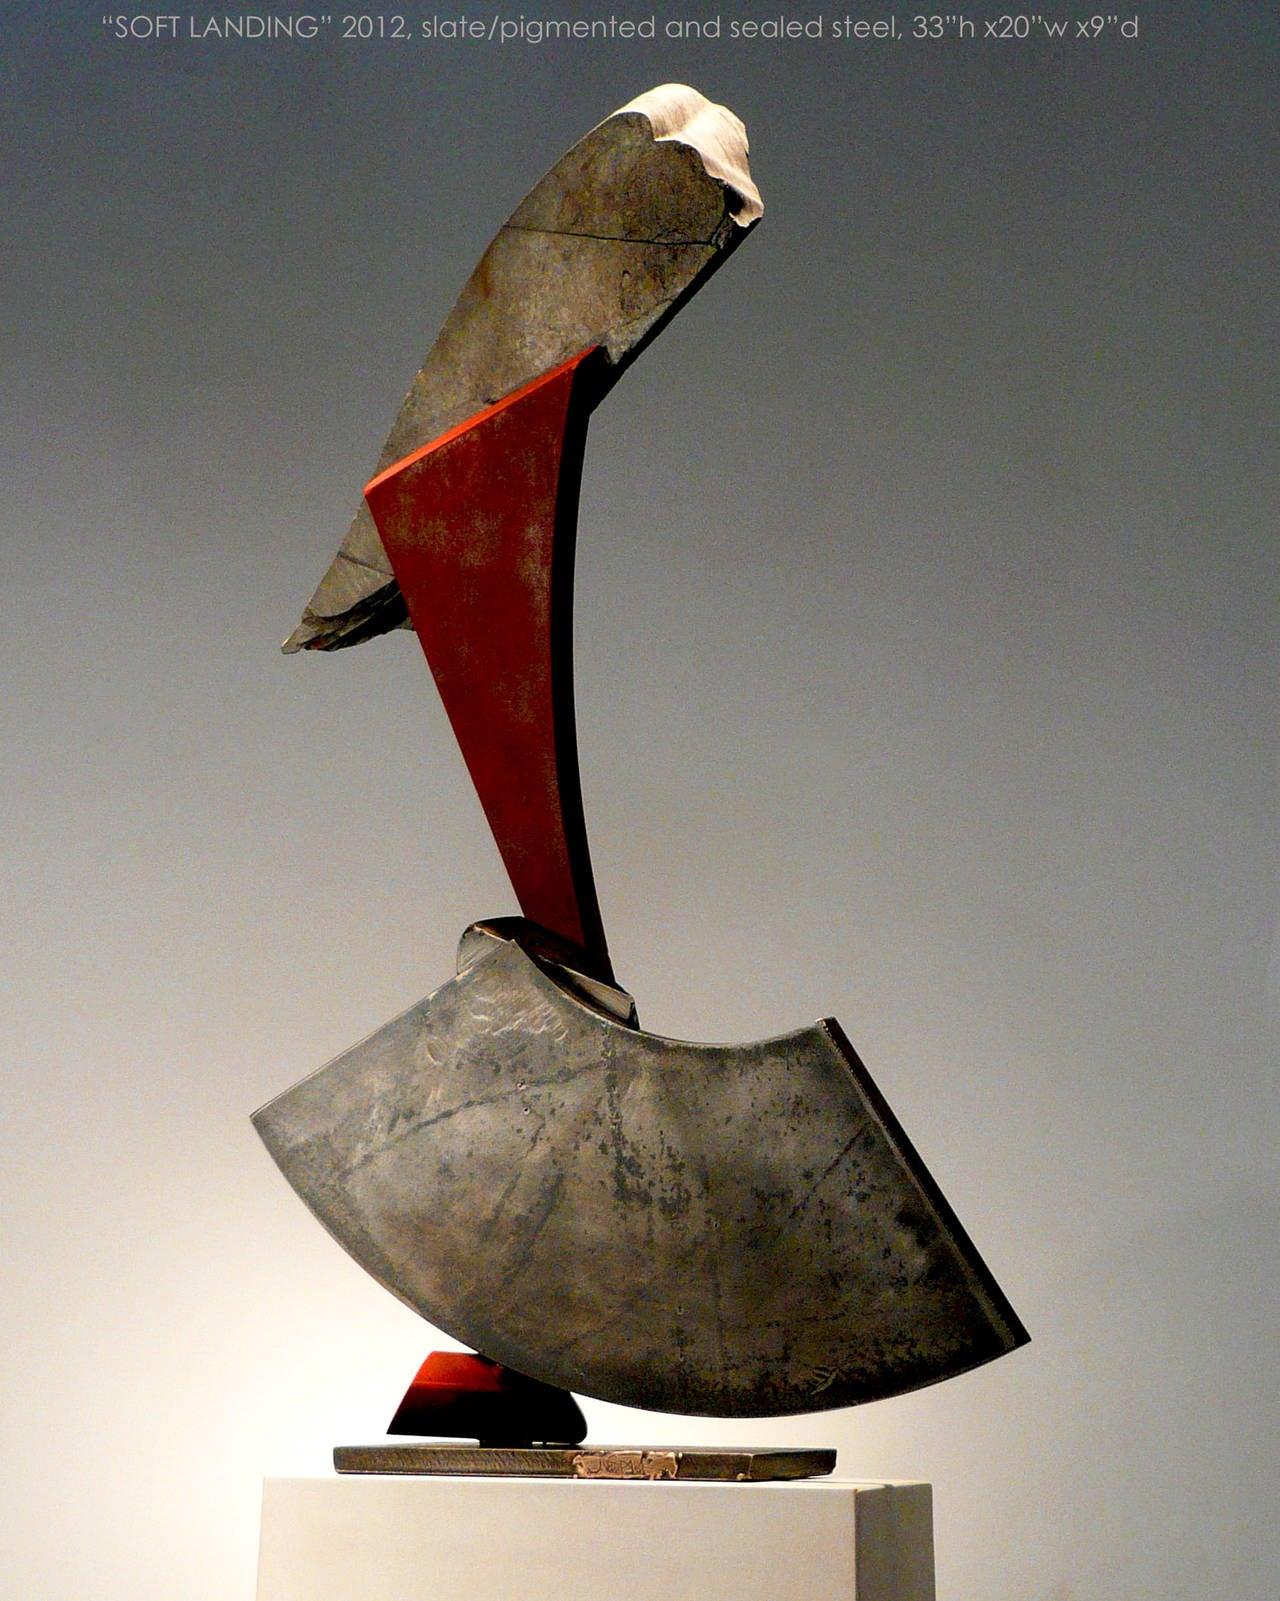 Soft Landing - Sculpture by John Van Alstine